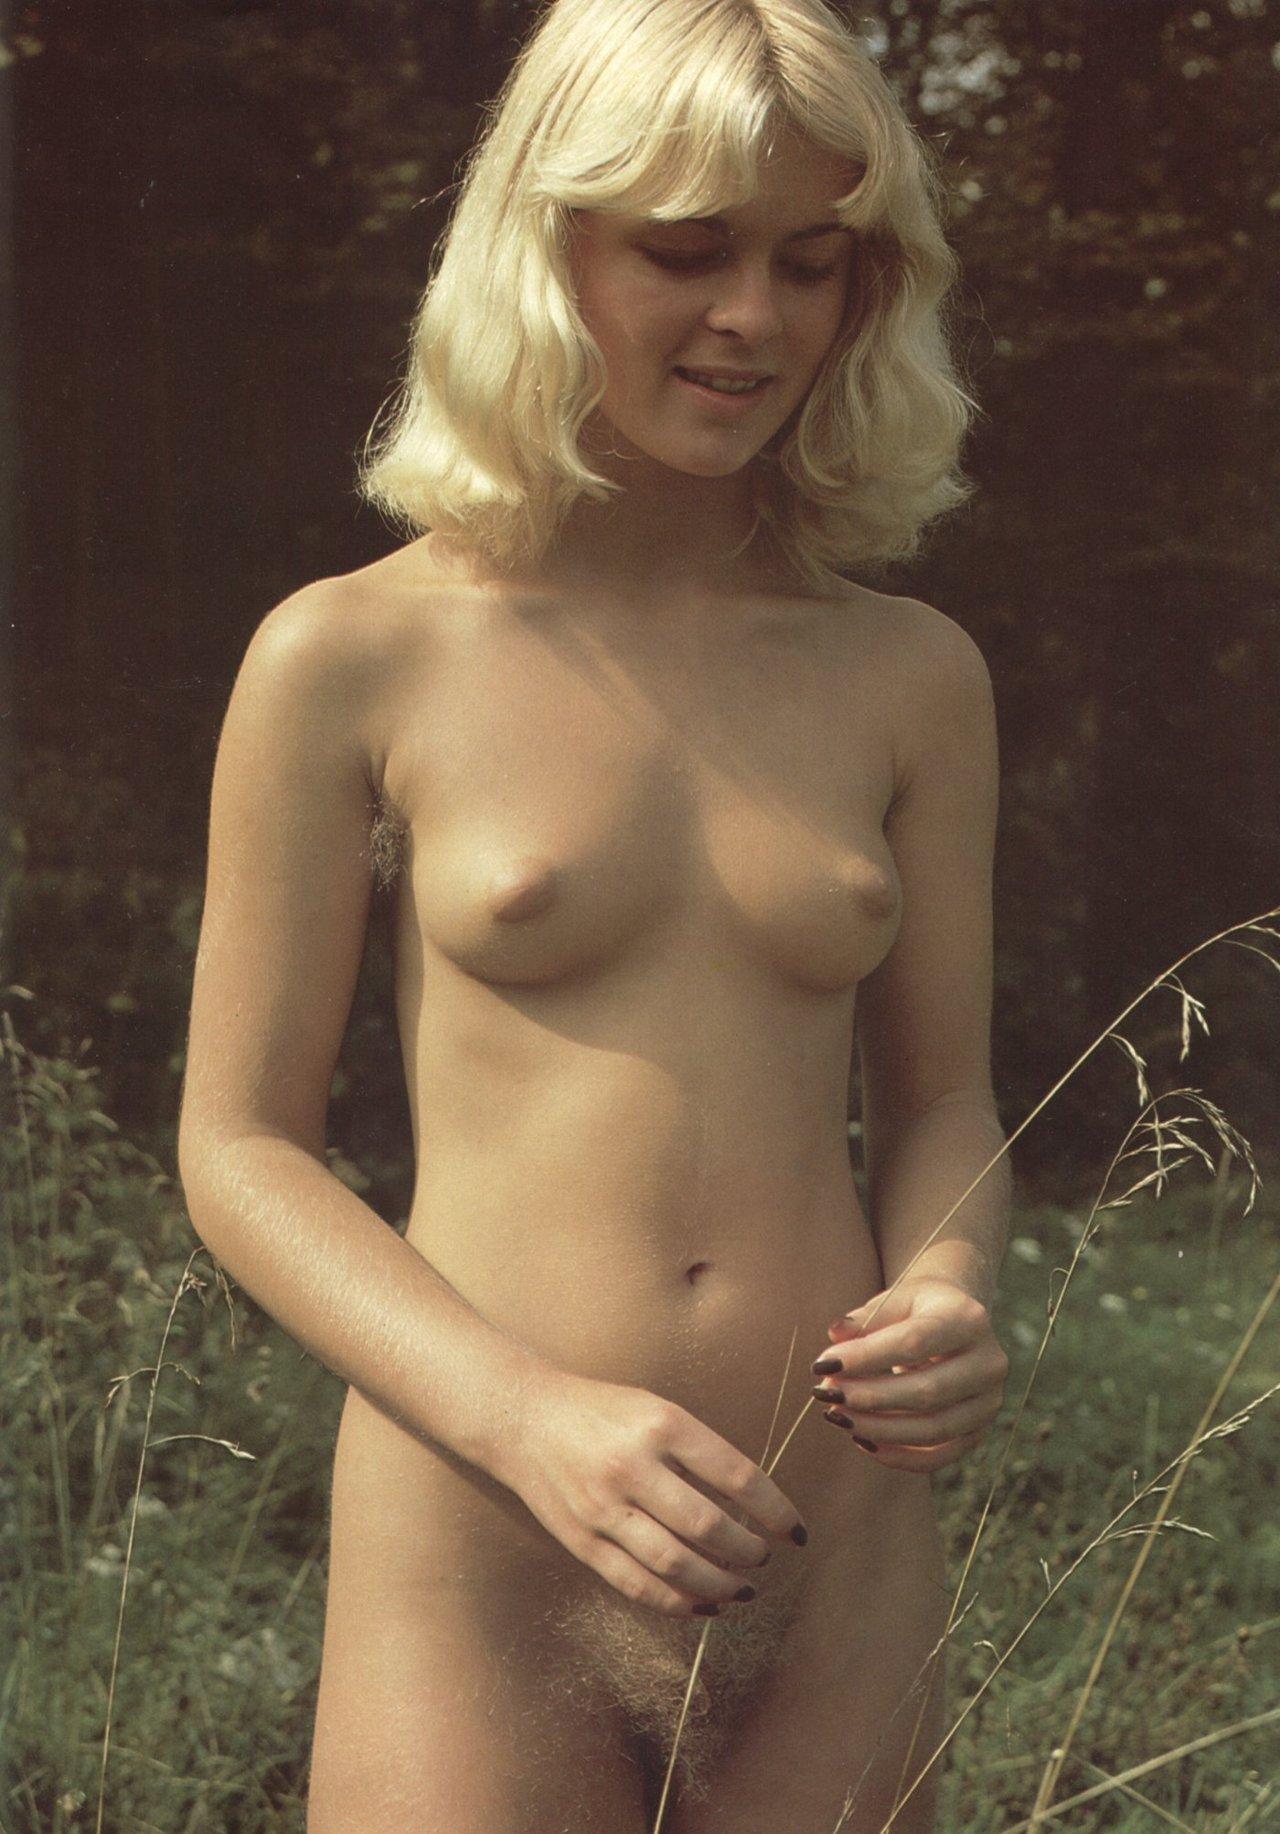 https://www.nudismlife.com/galleries/nudists_and_nude/the_most_natural_nudists/the_most_natural_nudists_0036.jpg